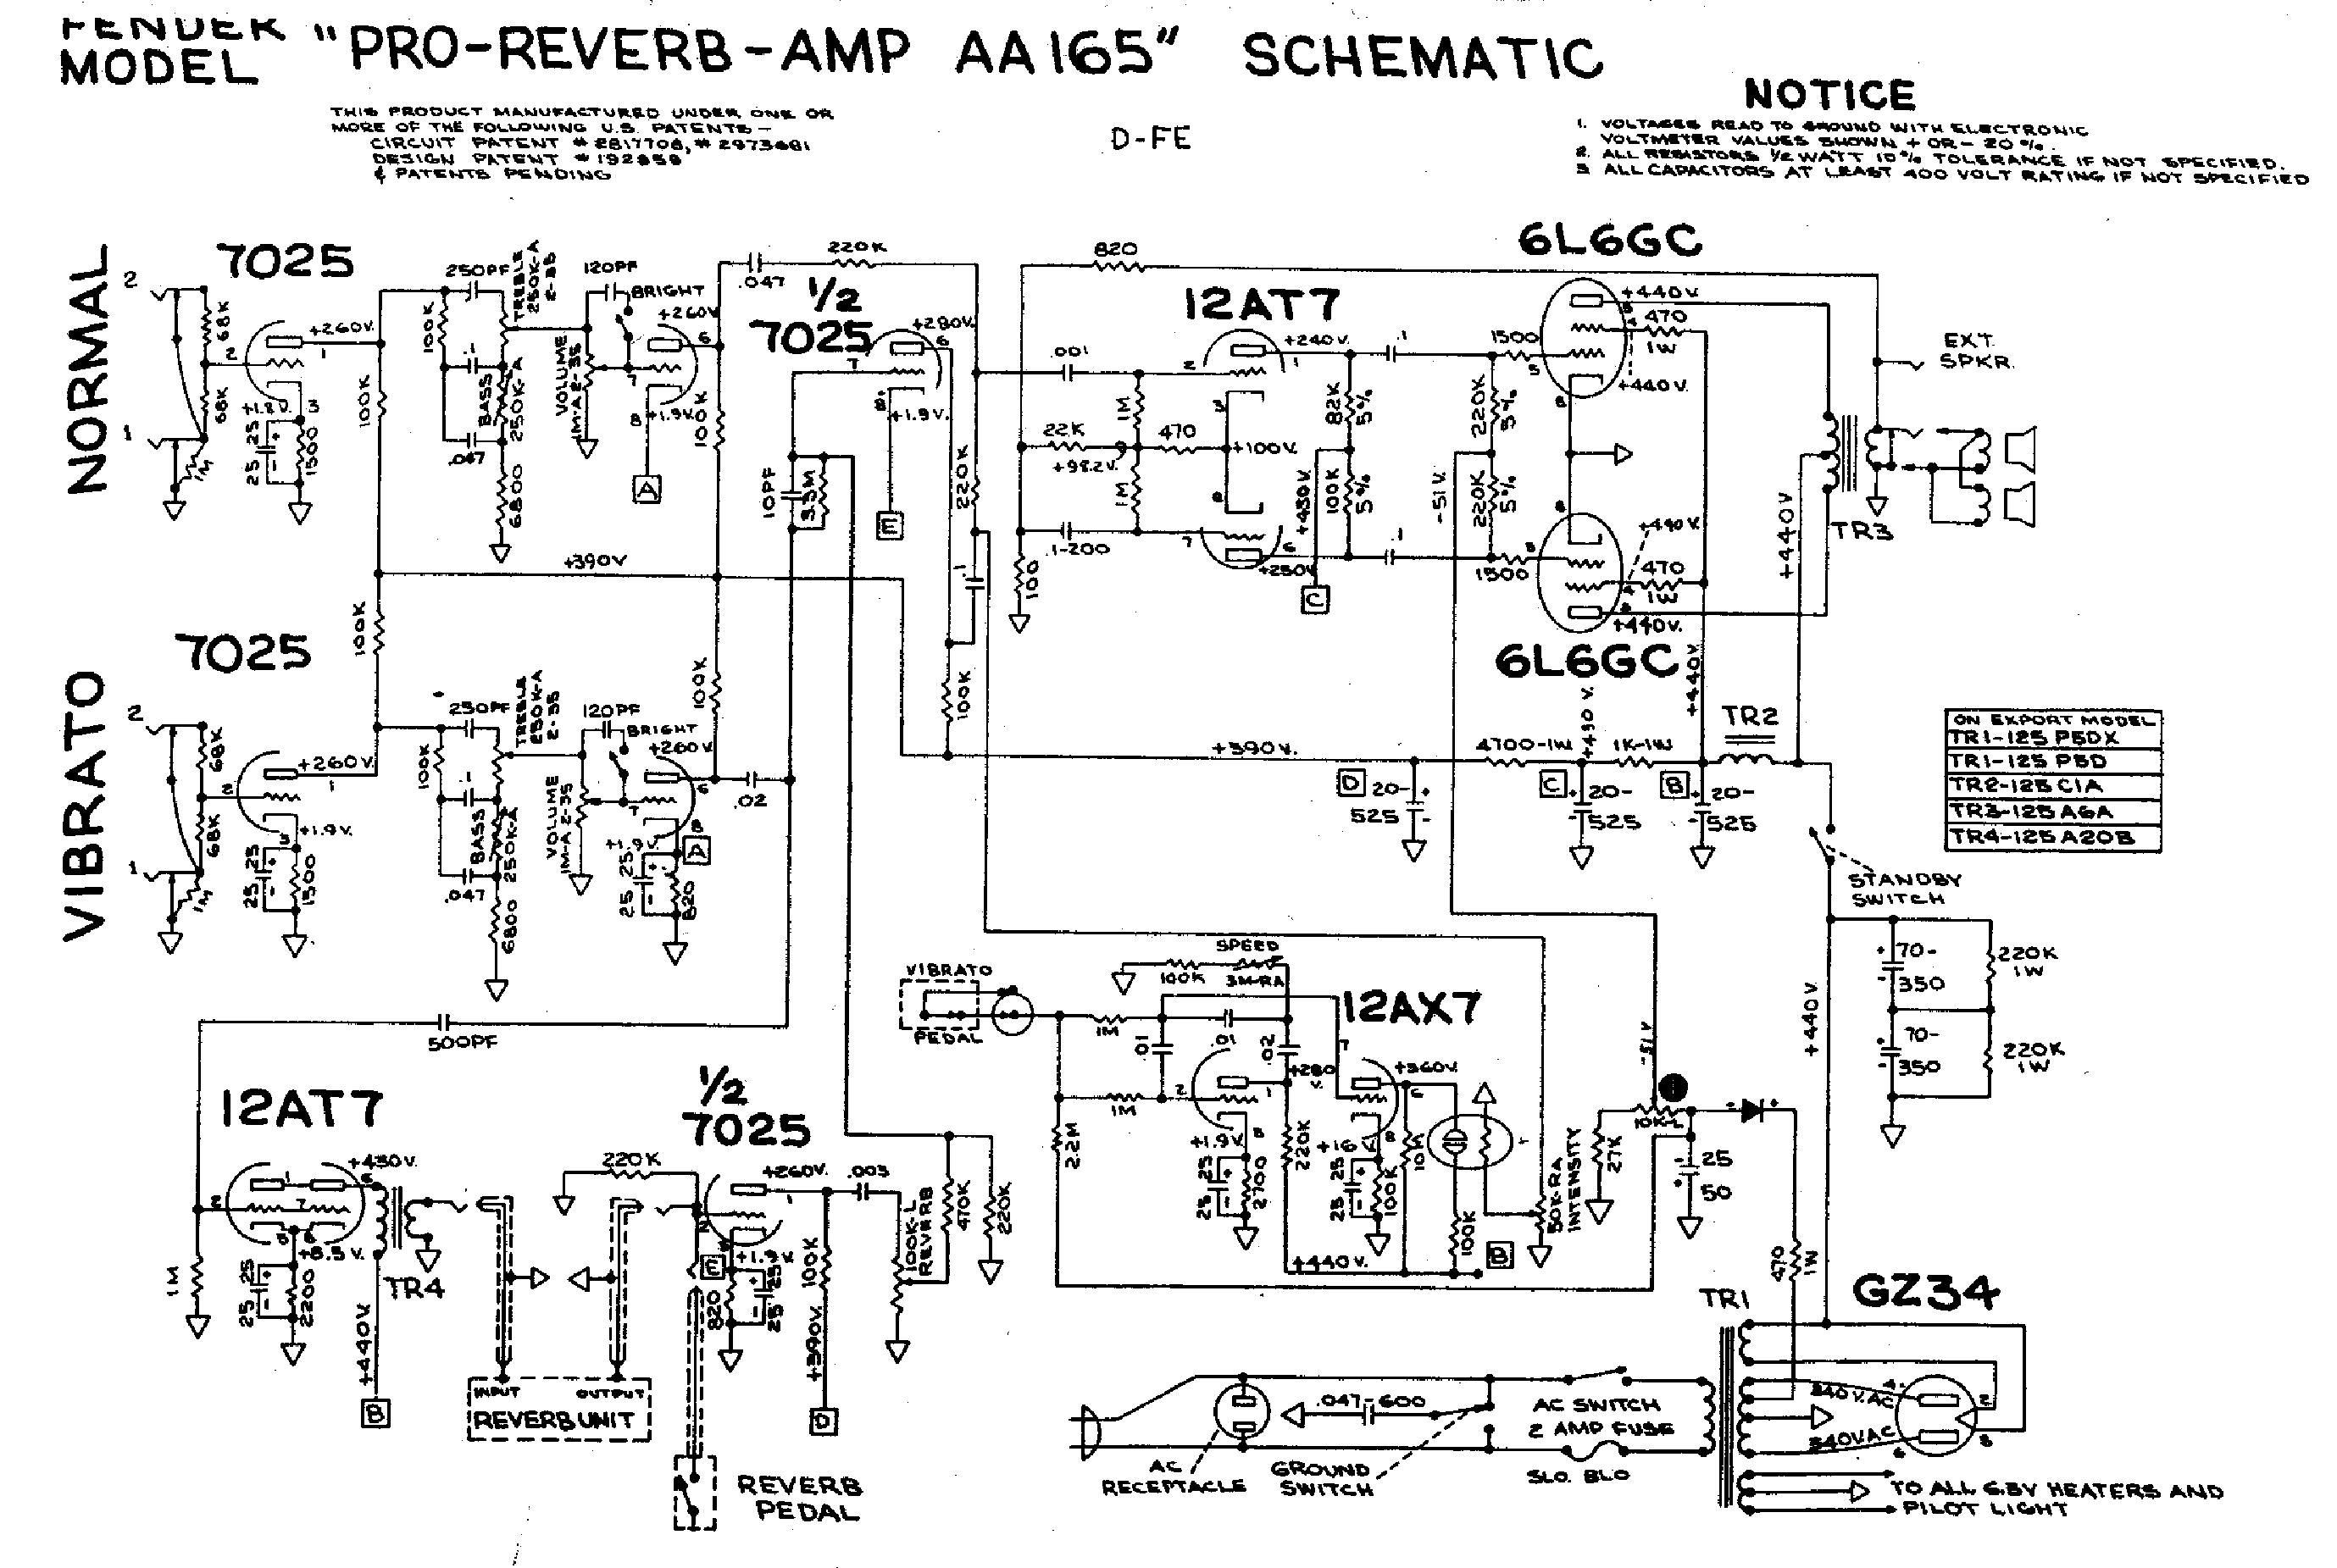 fender stage 1000 1600 guitar amplifier sch service manual